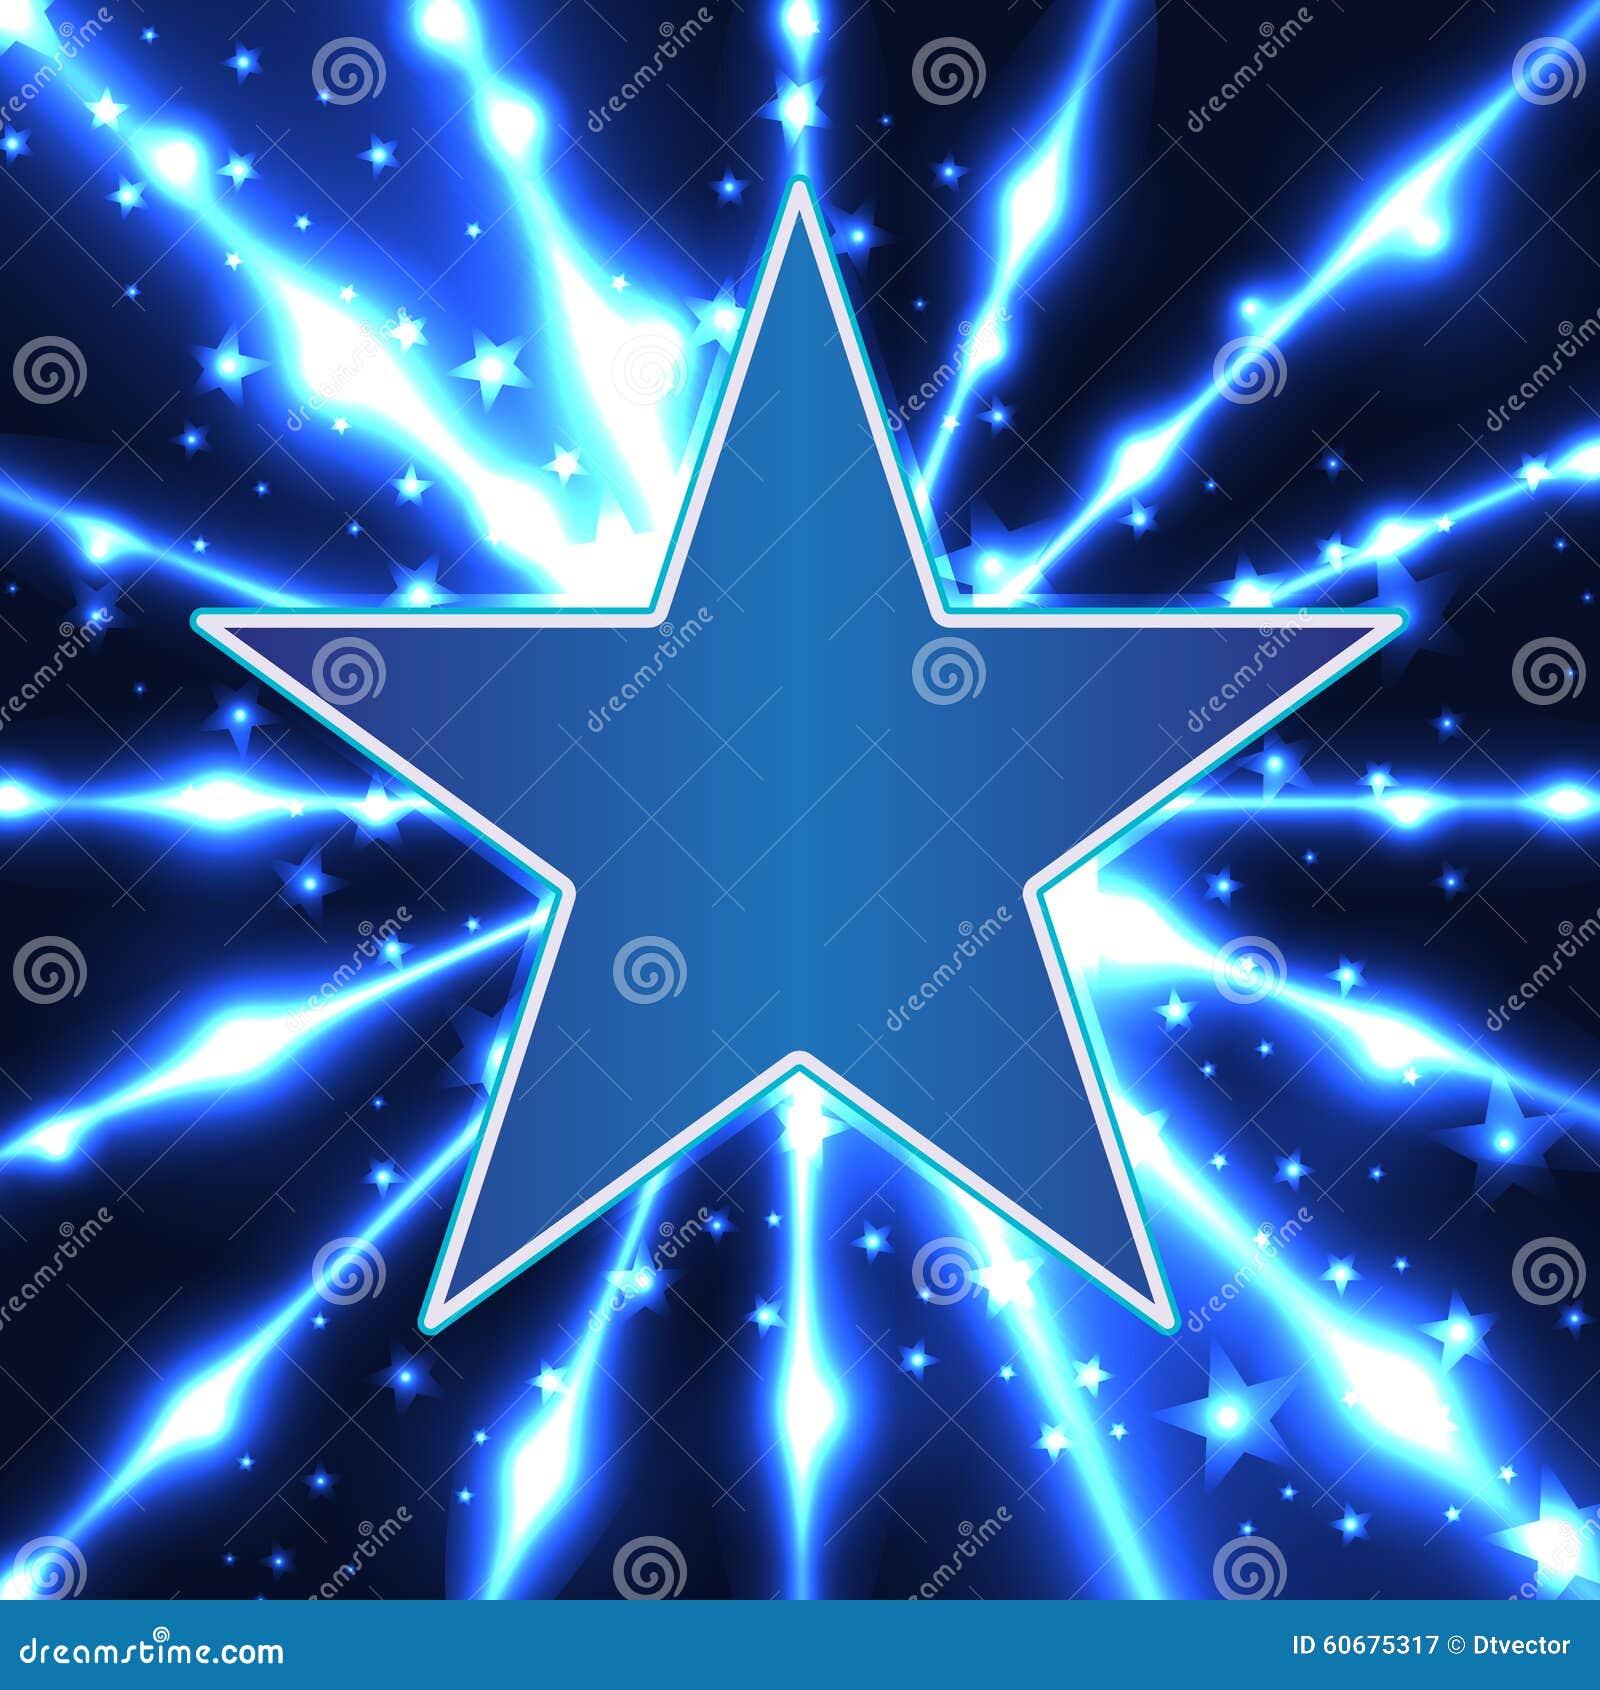 Star blue design template